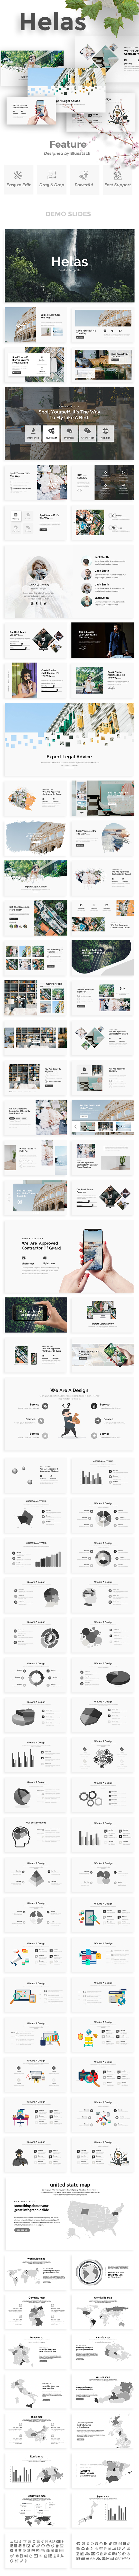 Helas Minimal Google Slide Template - Google Slides Presentation Templates